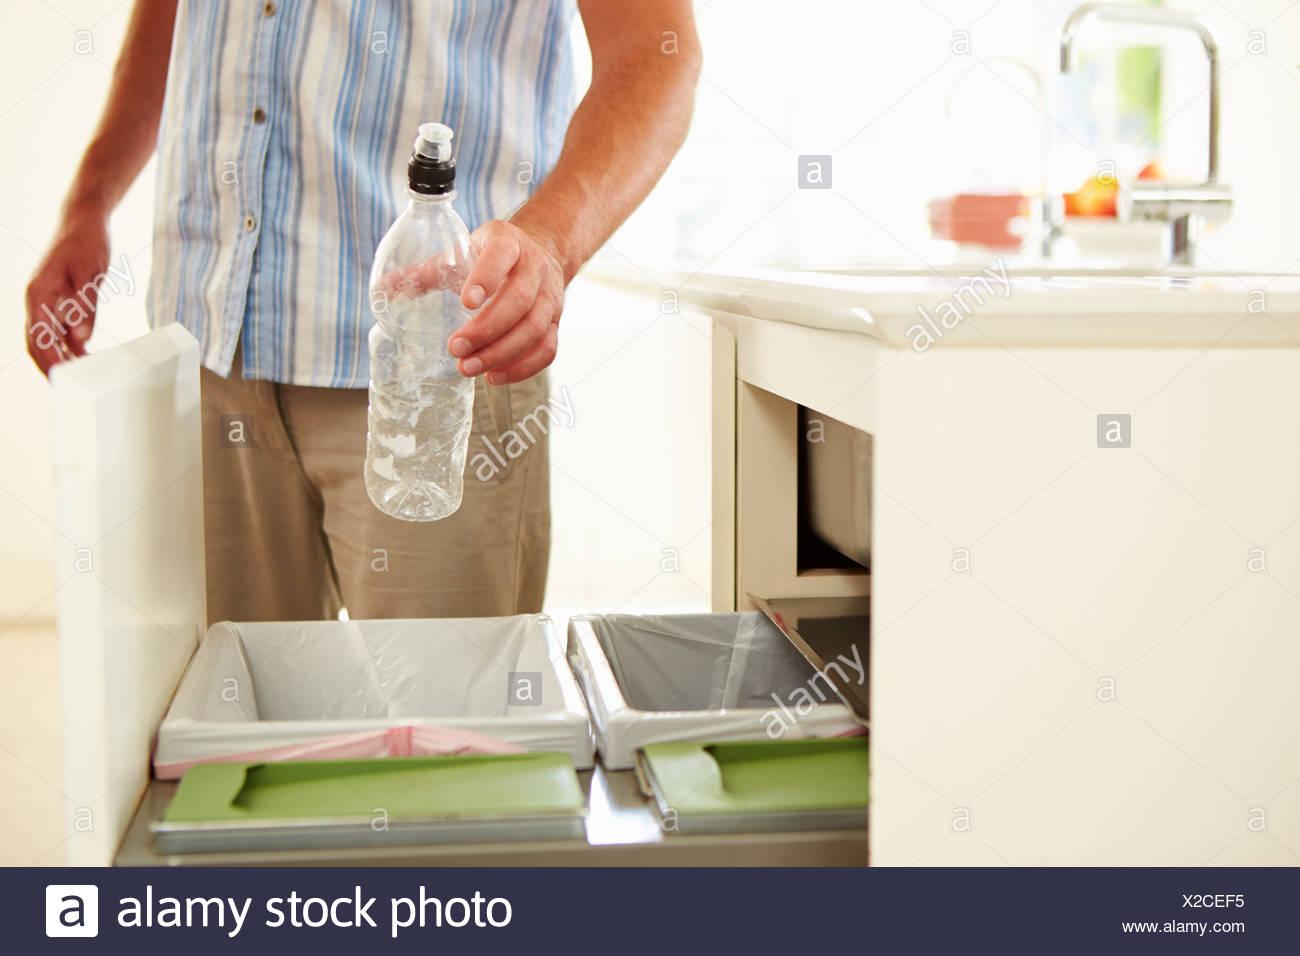 Nahaufnahme des Mannes Recycling Küchenabfälle In Papierkorb Stockbild